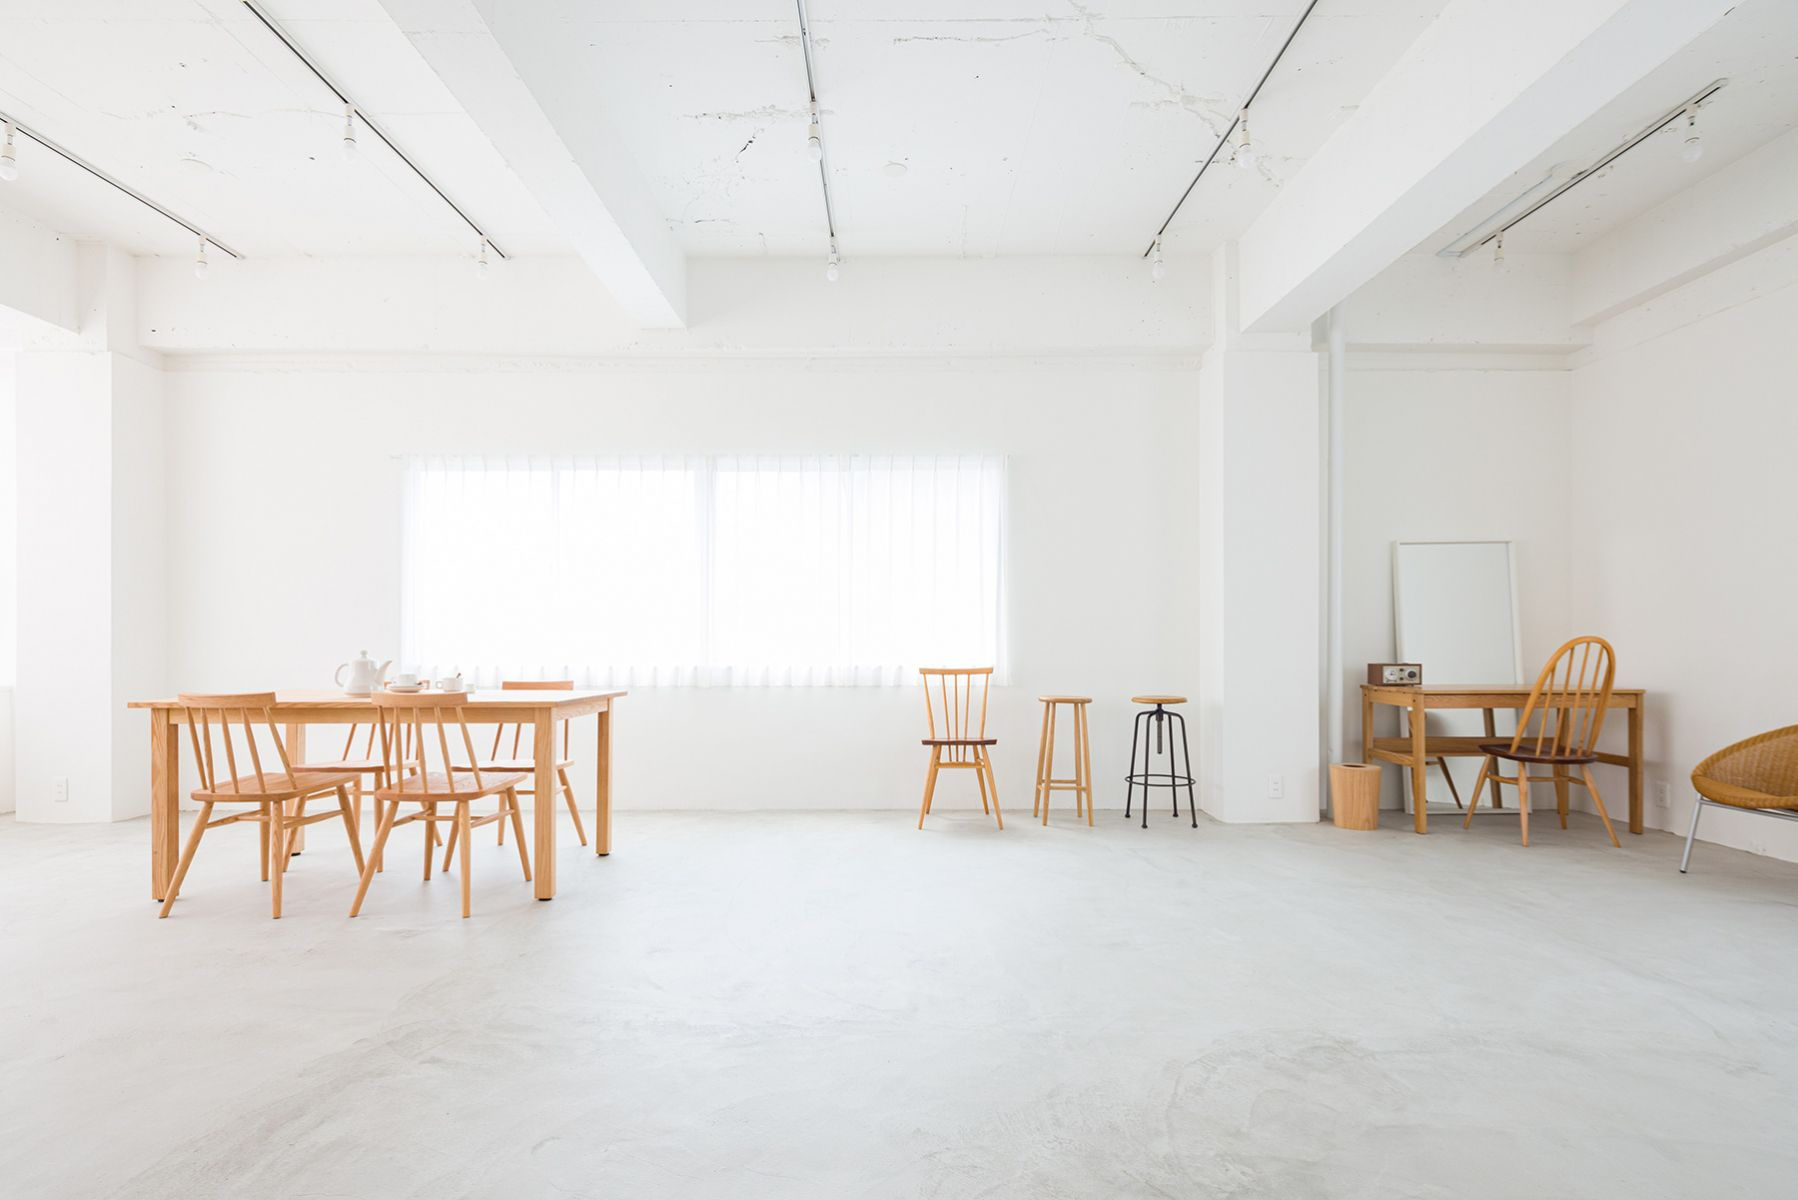 studio Flocke 目黒 (スタジオフロック)